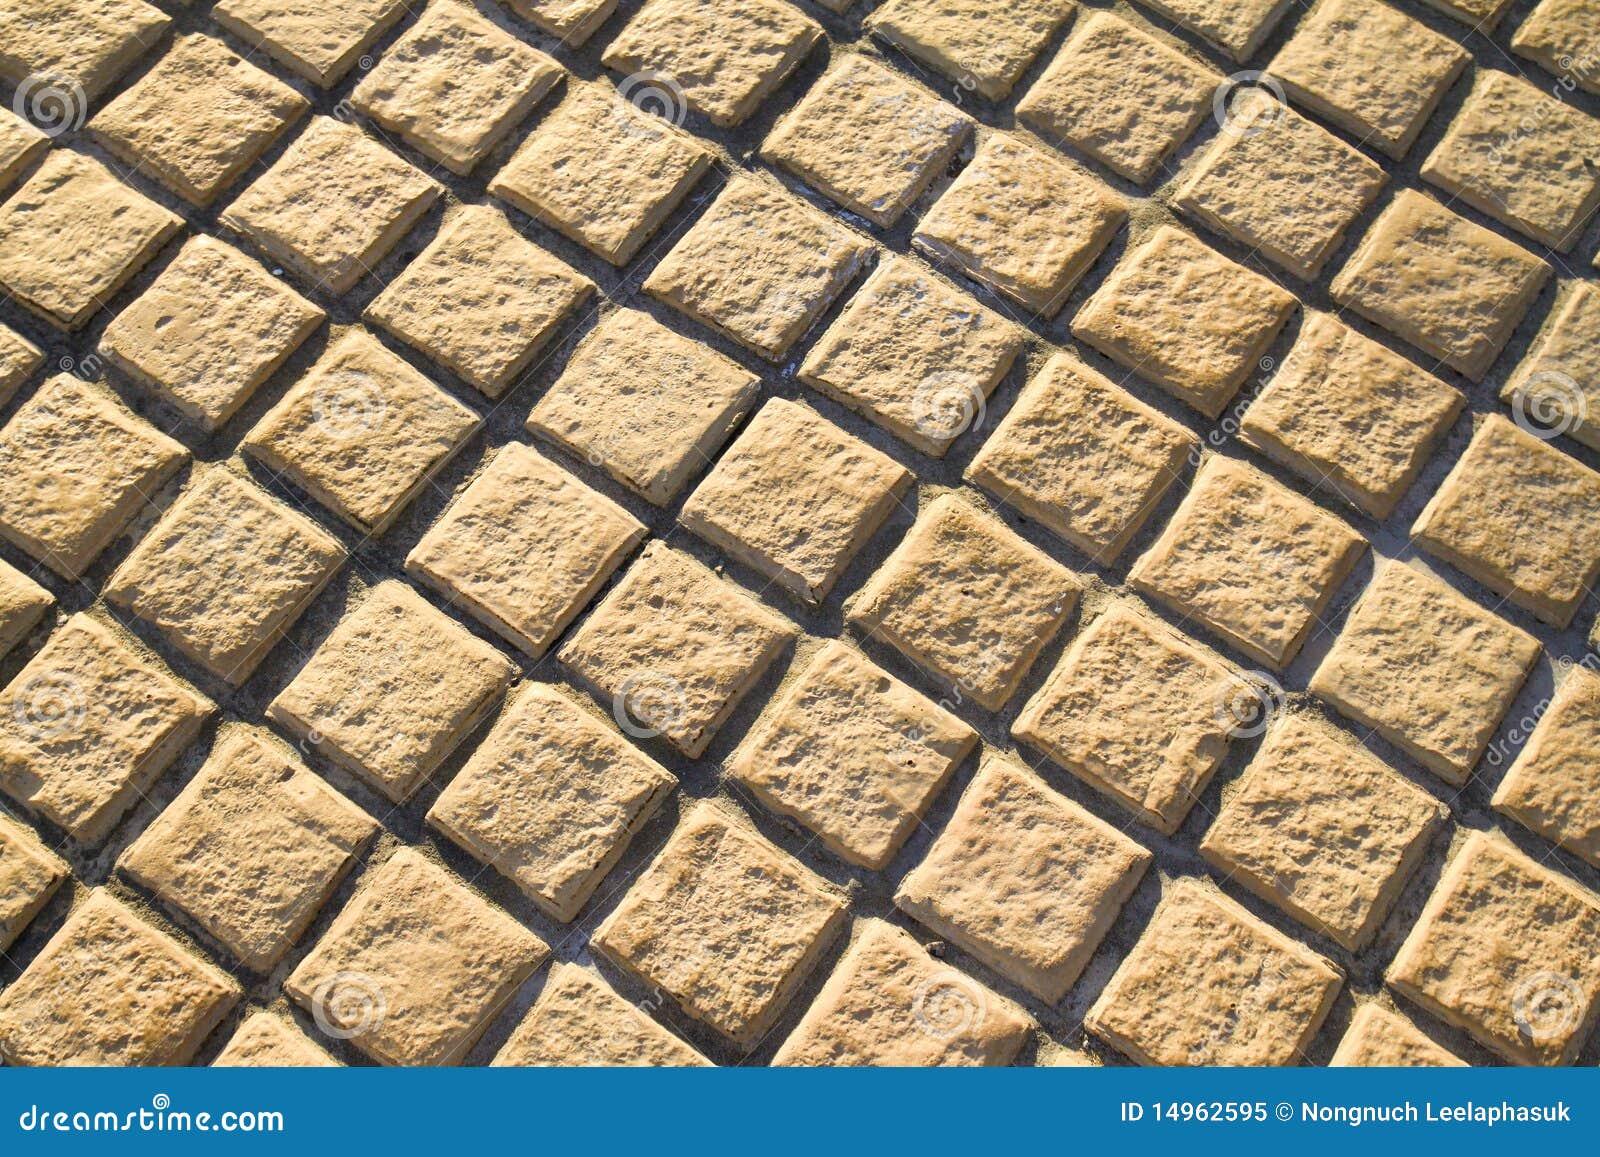 ladrillo pavimento suelo